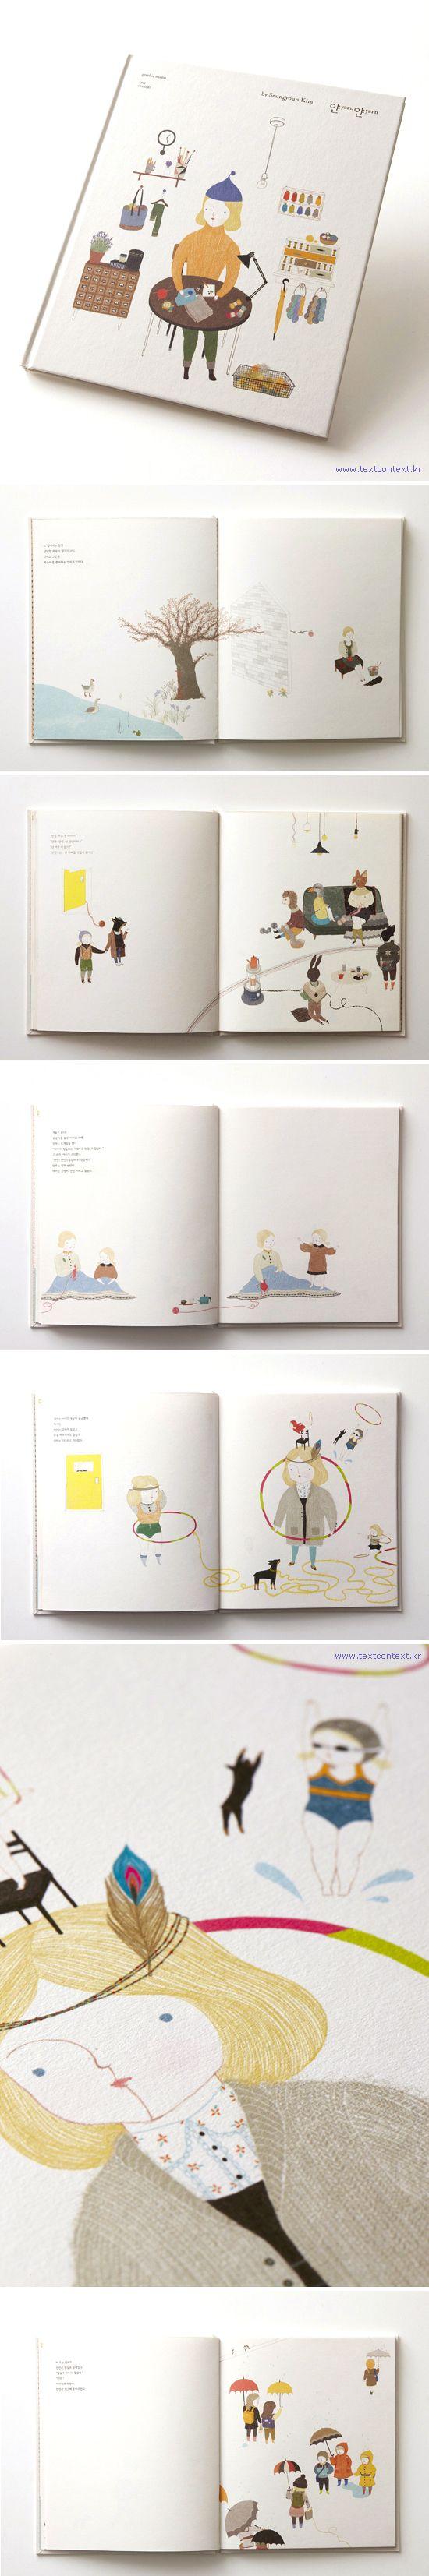 yarnyarn_ picture book by Seungyoun Kim, via Behance